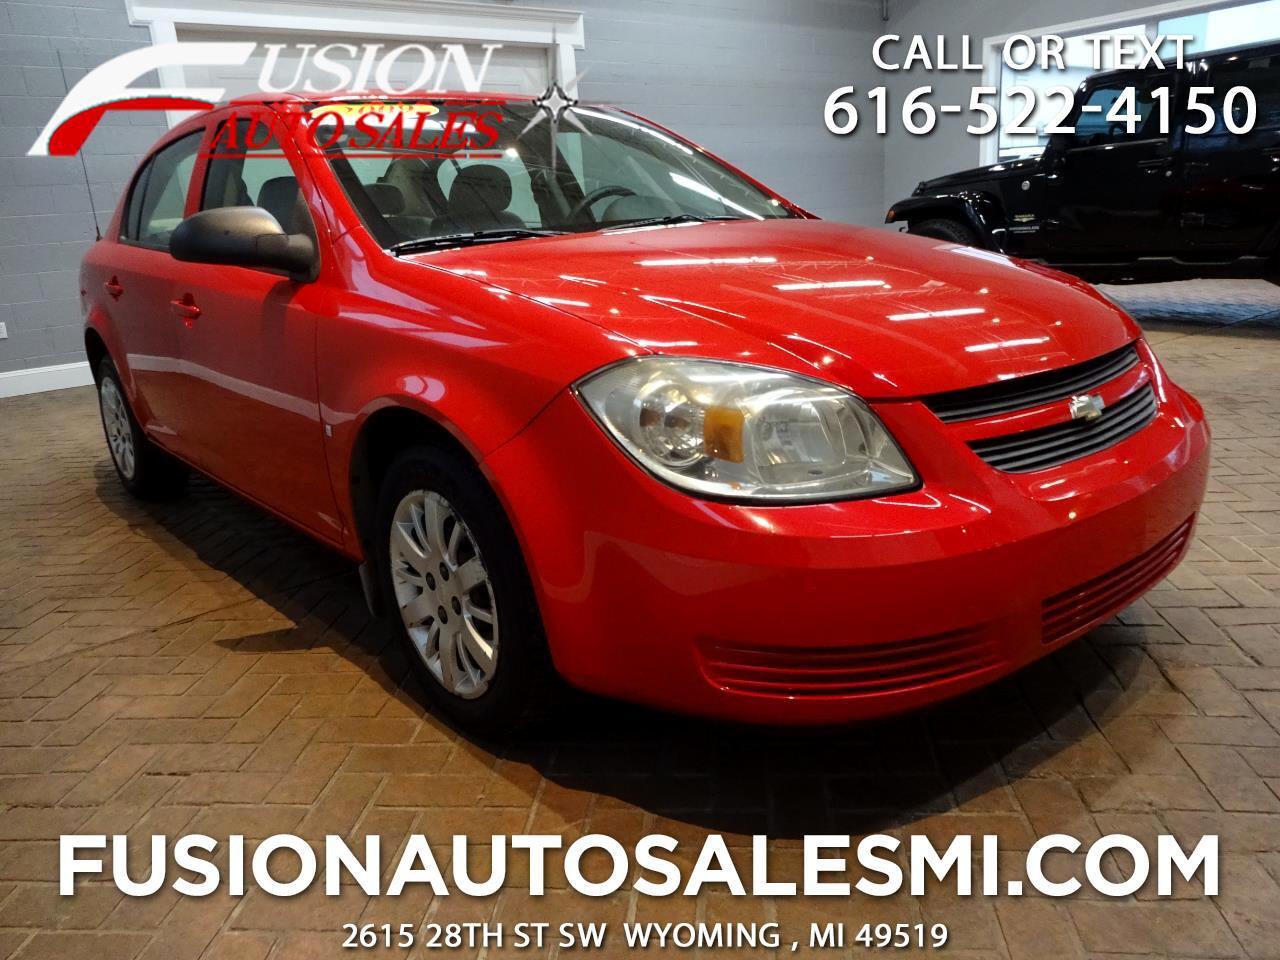 2009 Chevrolet Cobalt 4dr Sdn LS